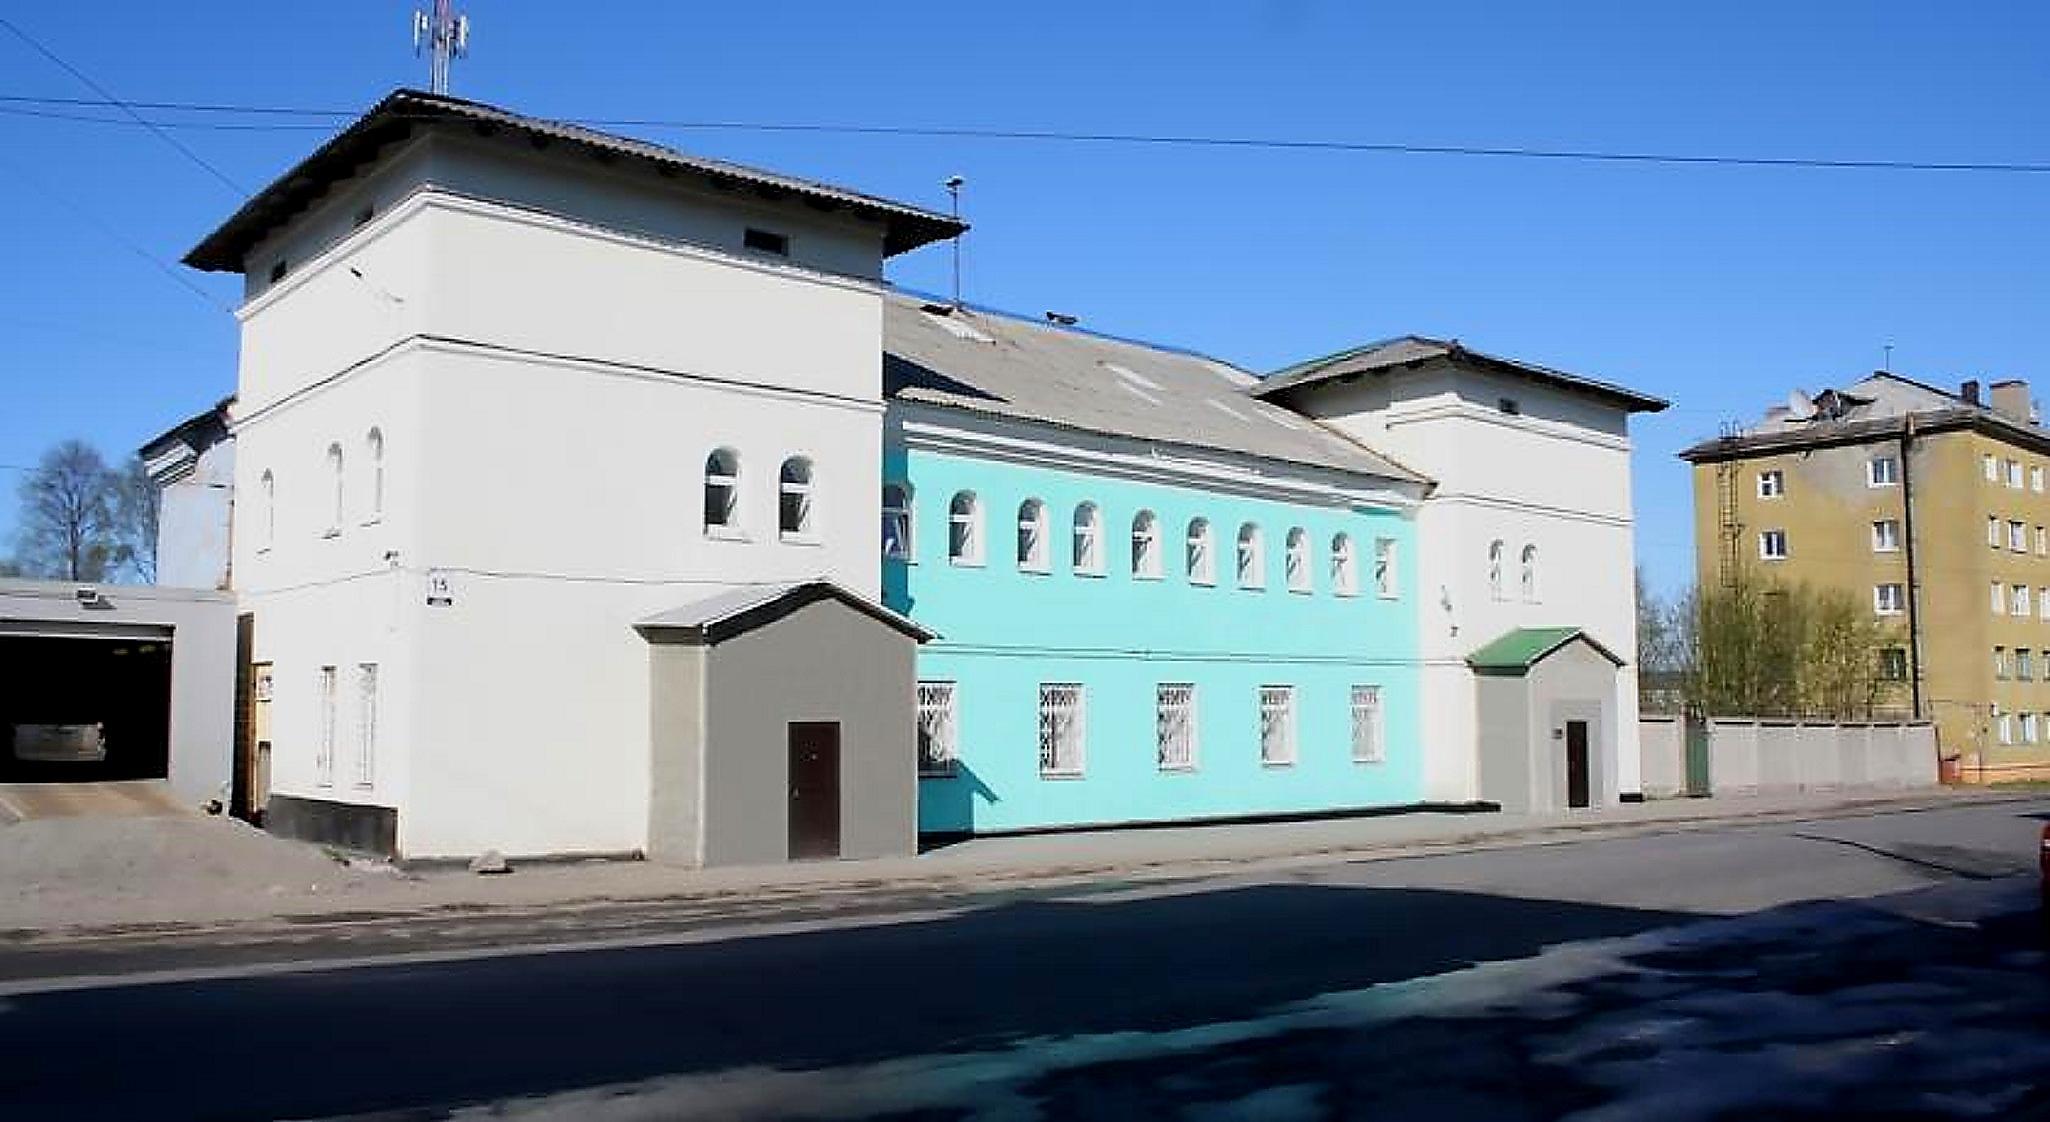 Fiord hotel, Murmansk